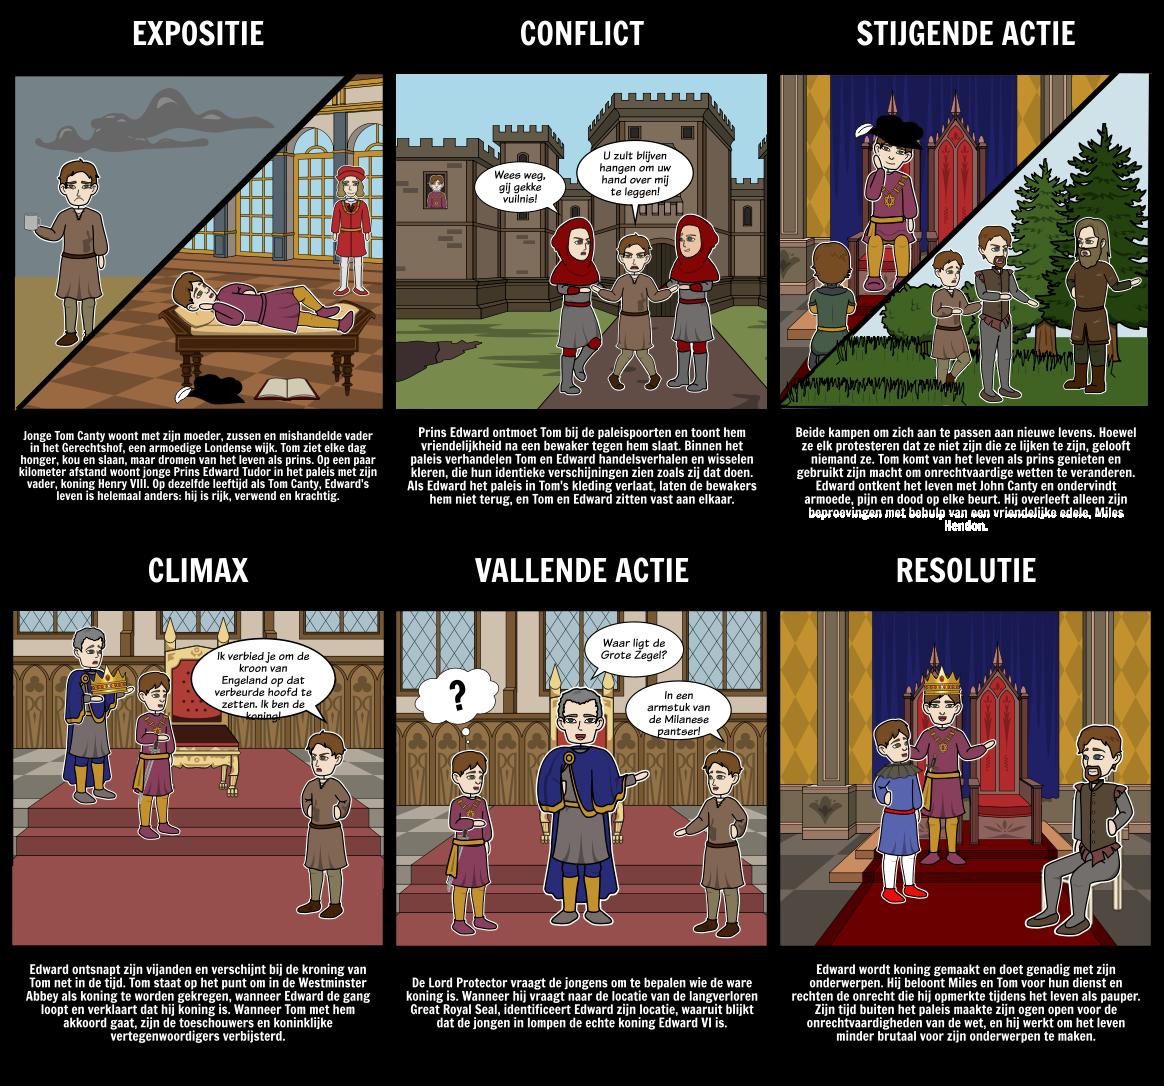 De Prins en het Pauper Plot Diagram